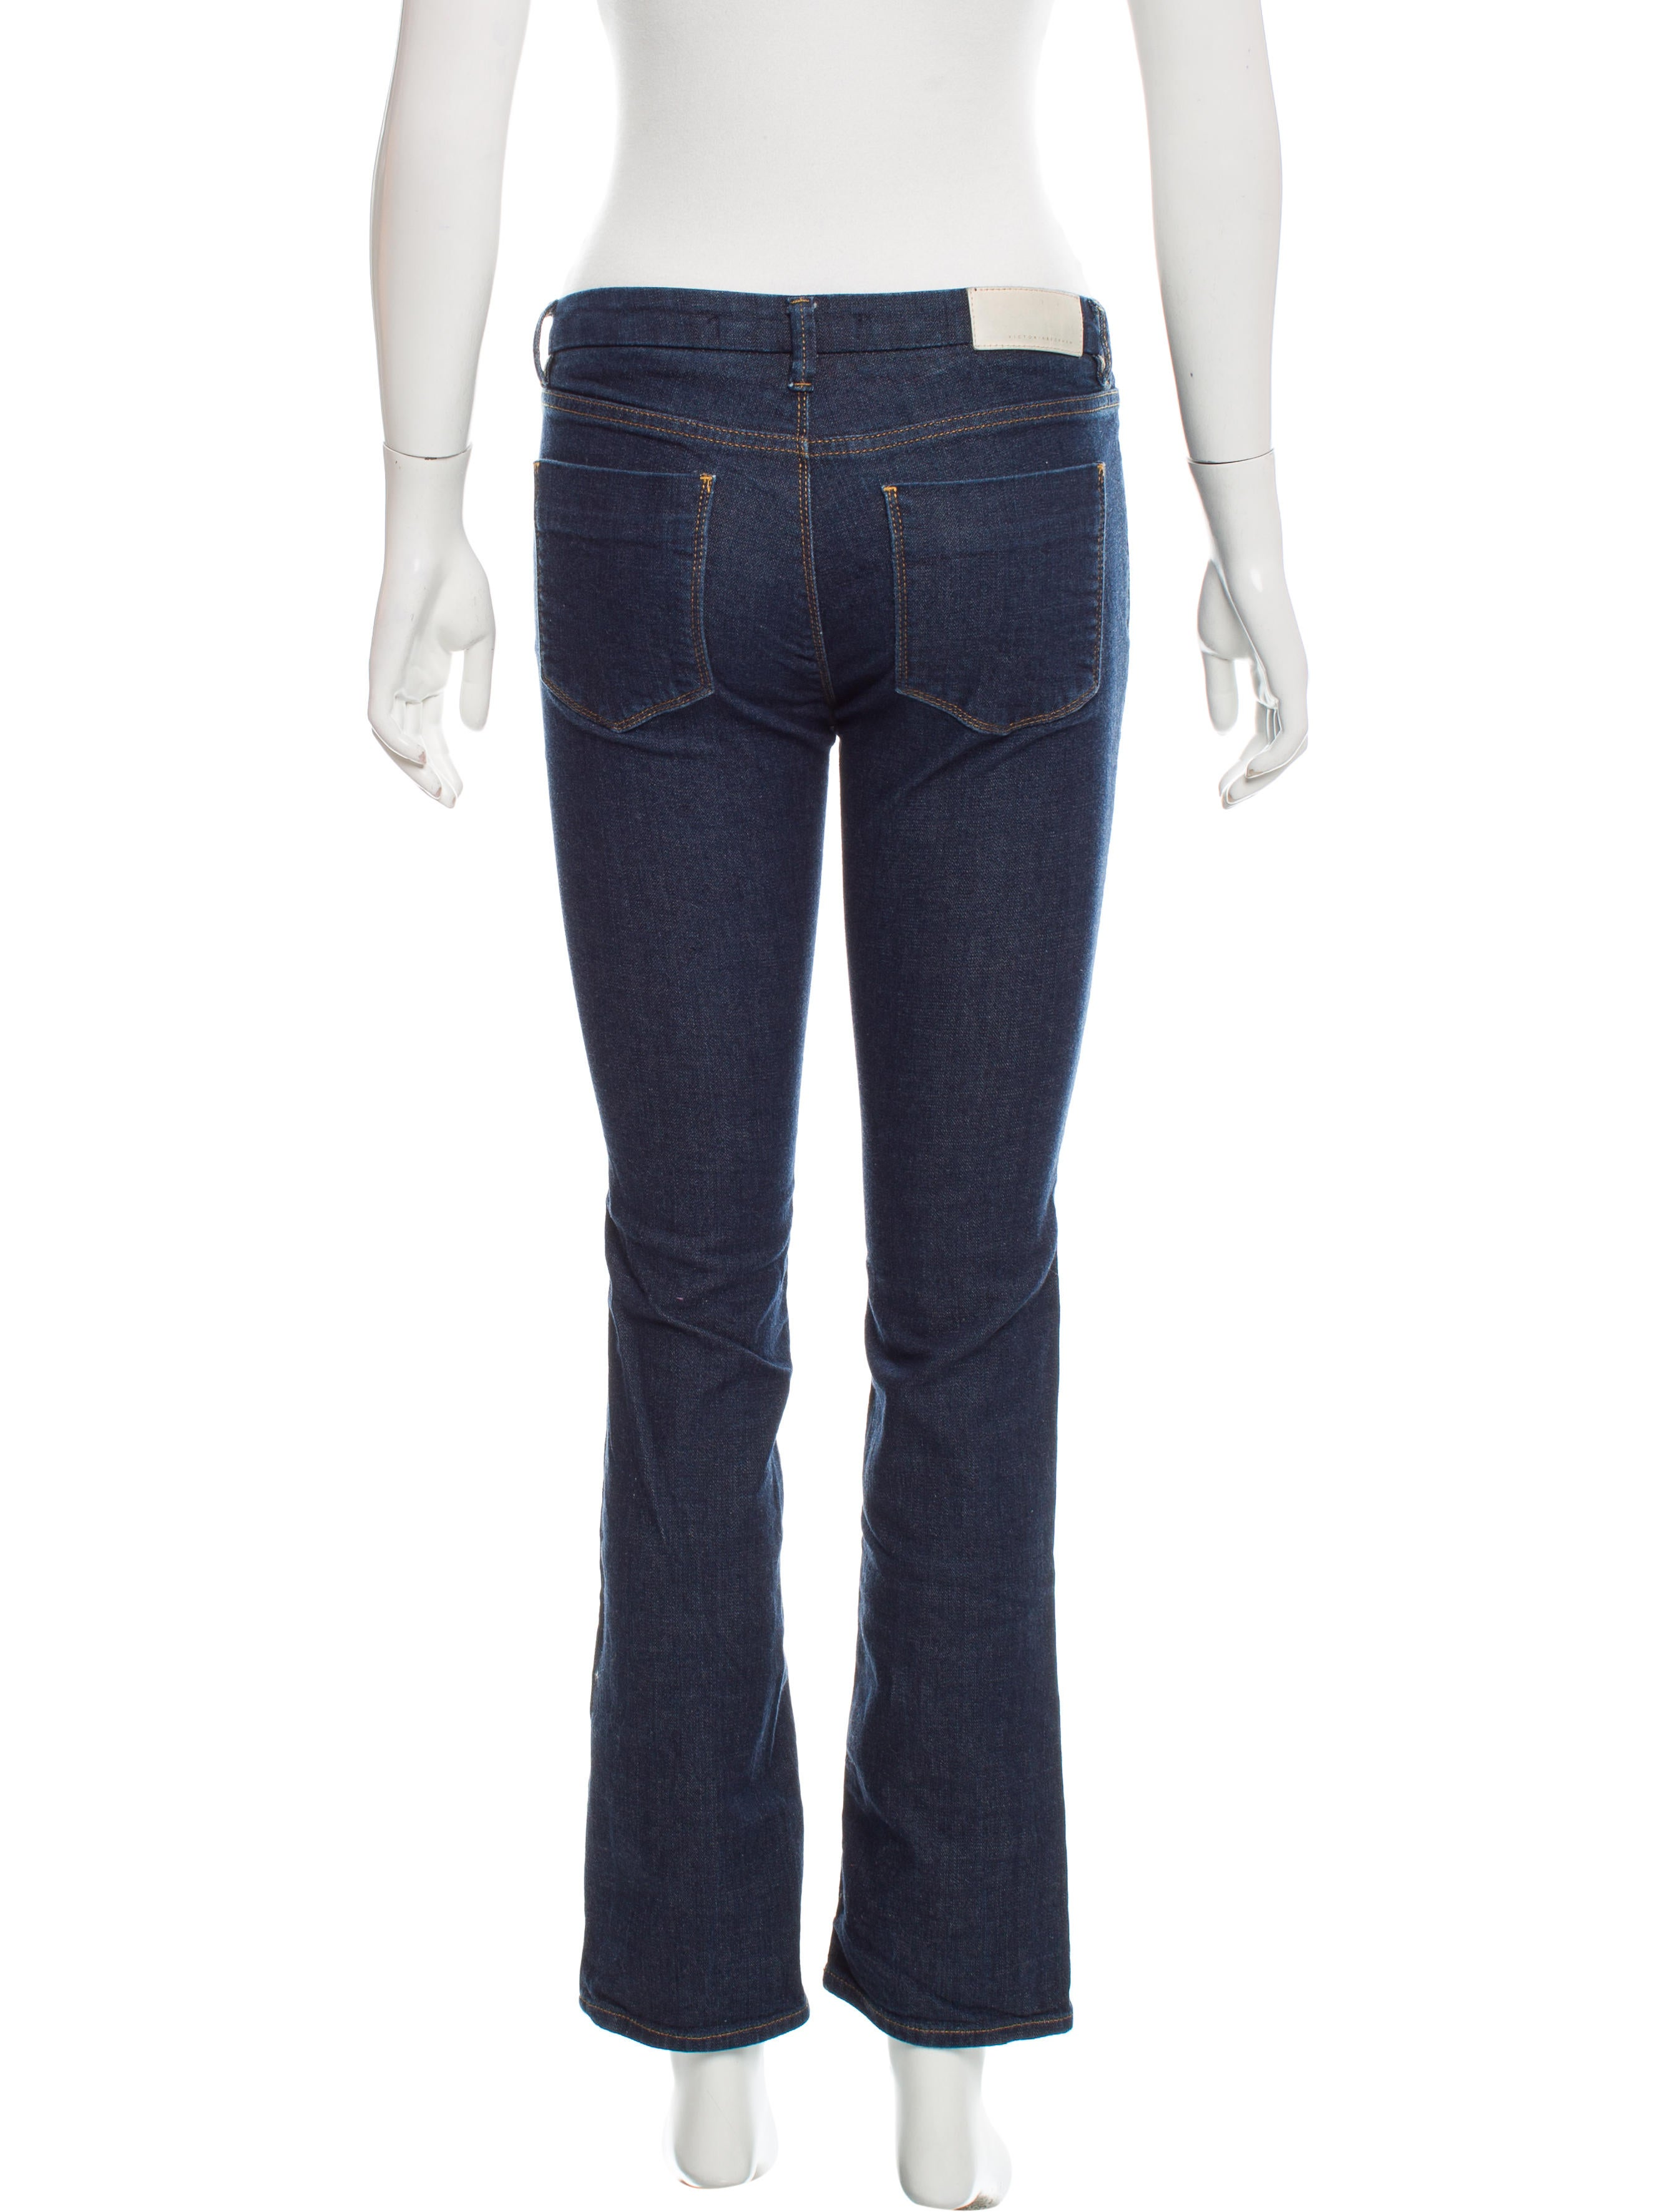 Victoria Beckham Denim Low Rise Straight Leg Jeans